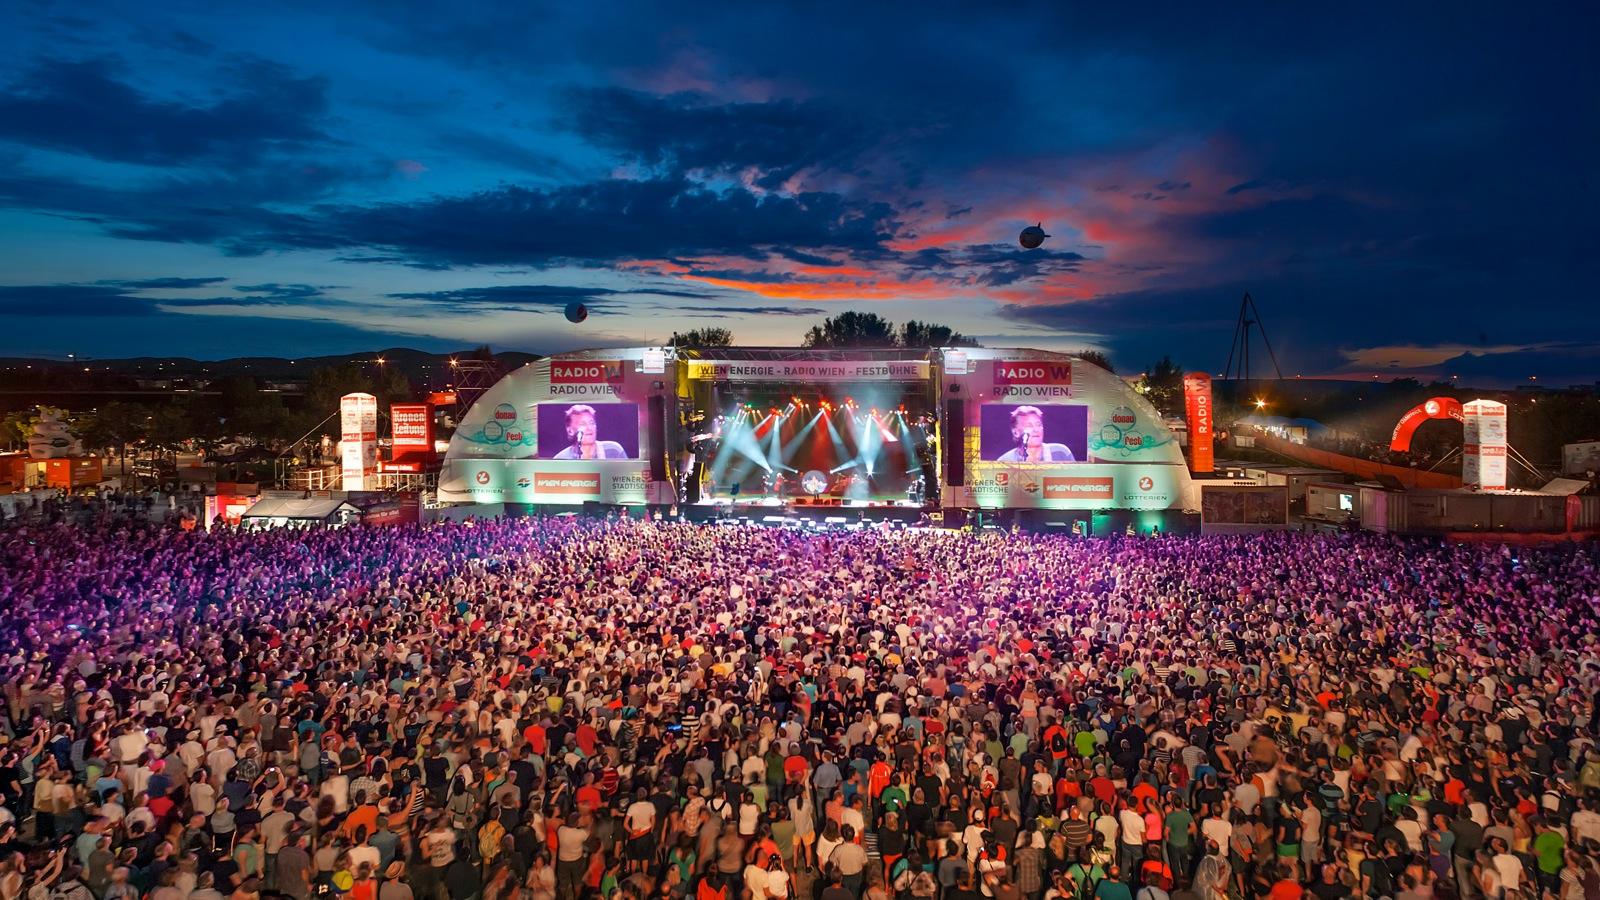 Donauinselfest 2020 In Wien Austria Everfest